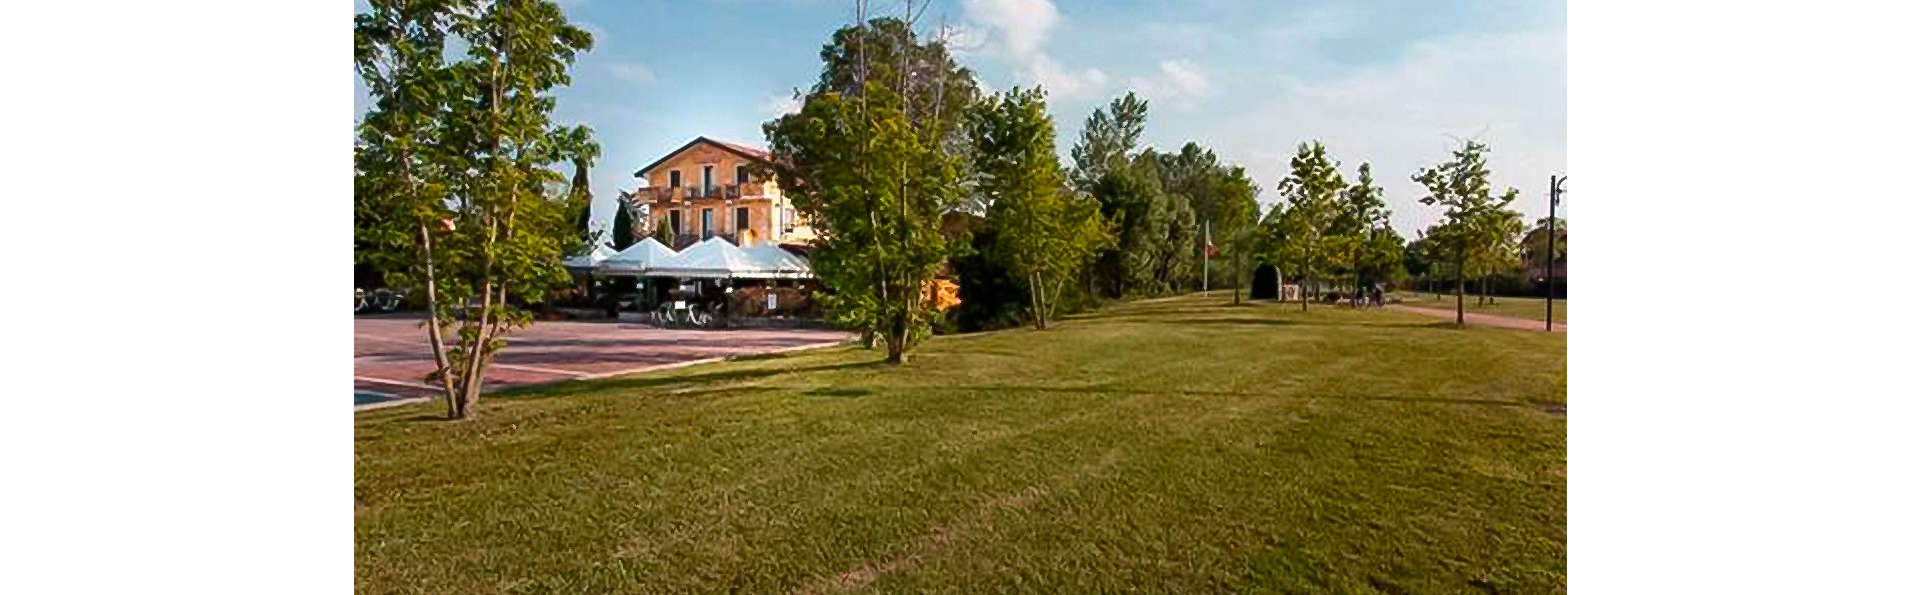 Hotel Riel - EDIT_FRONT_01.jpg